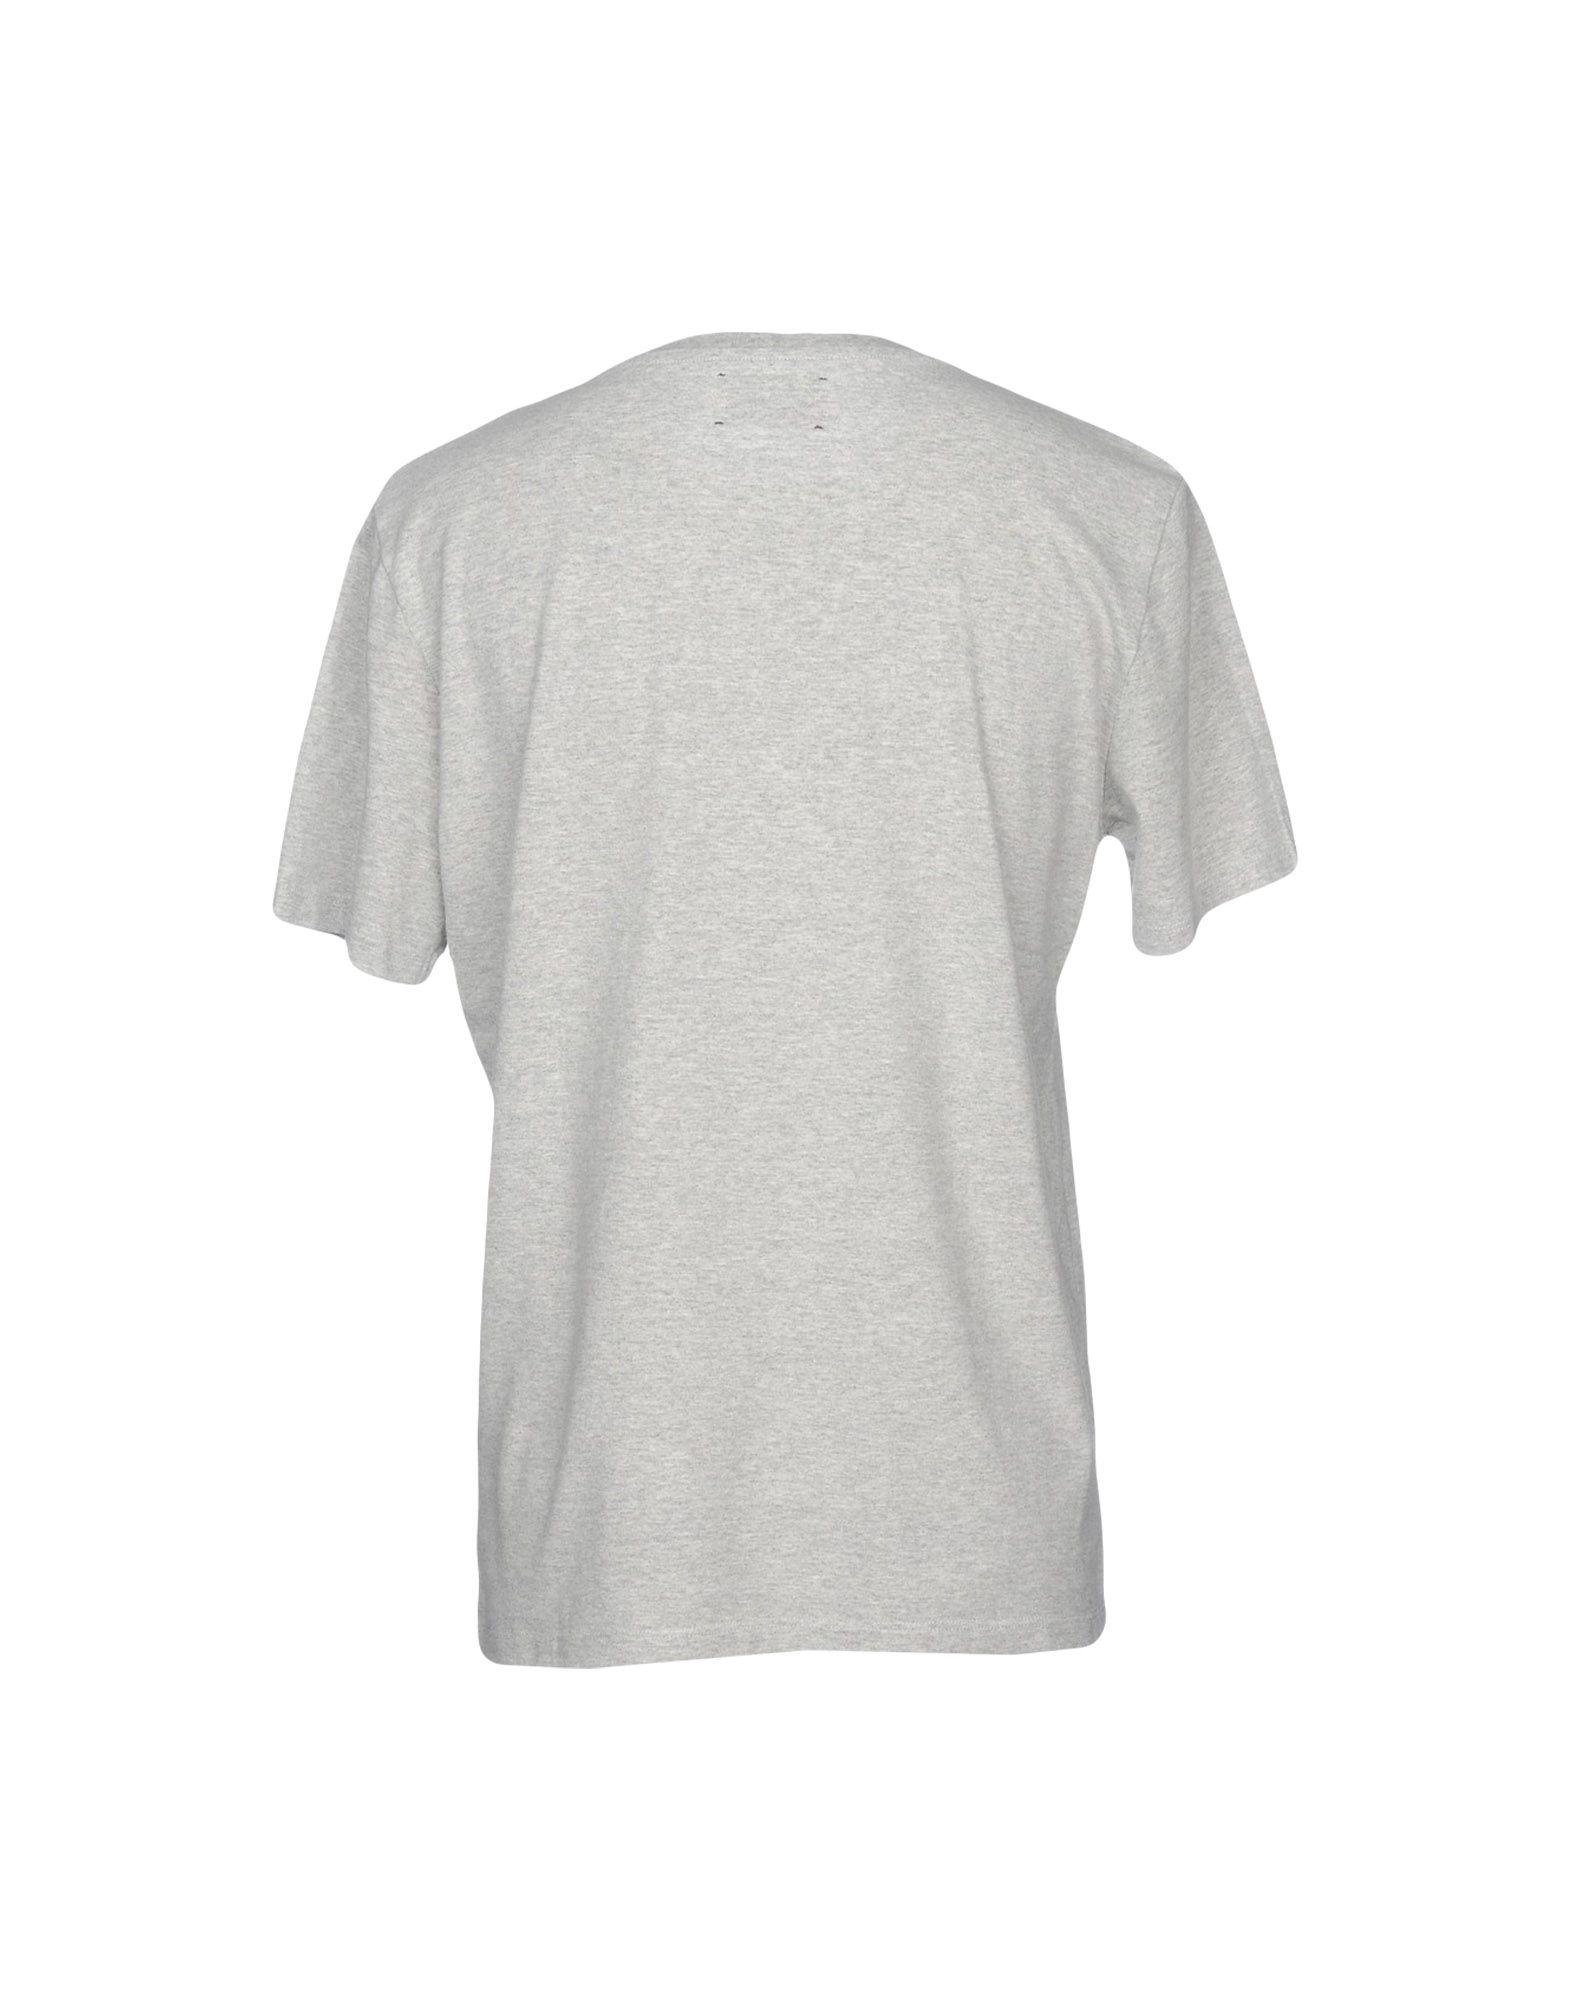 T-Shirt Ga Uomo lle Paris Uomo Ga - 12205315UE 7a64a6